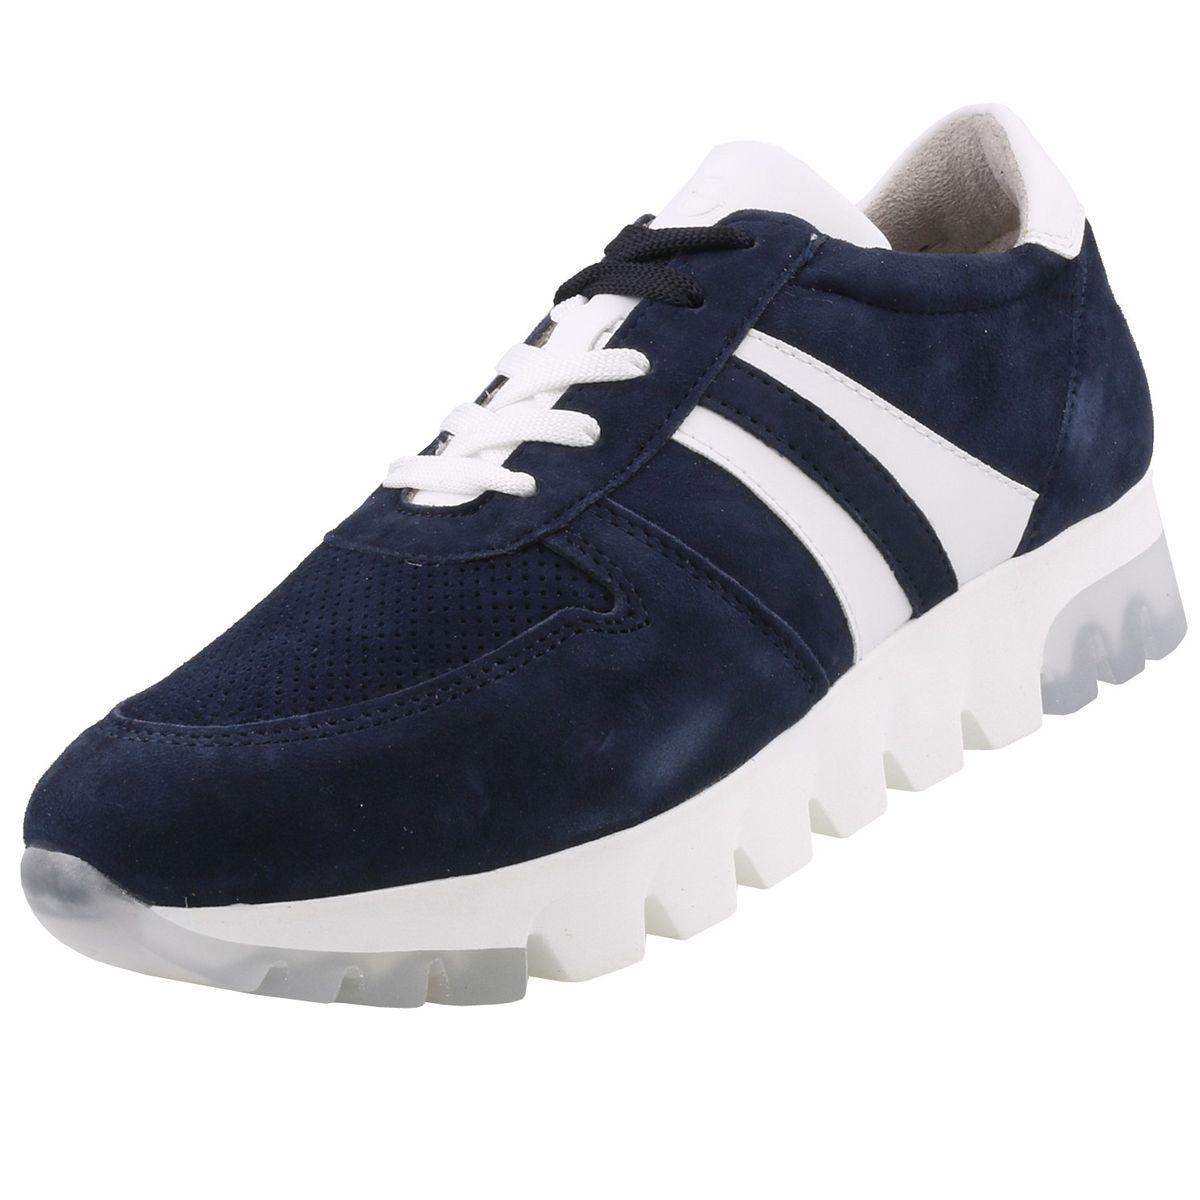 TAMARIS Damen Plateau Sneaker Blau | Trendbereich